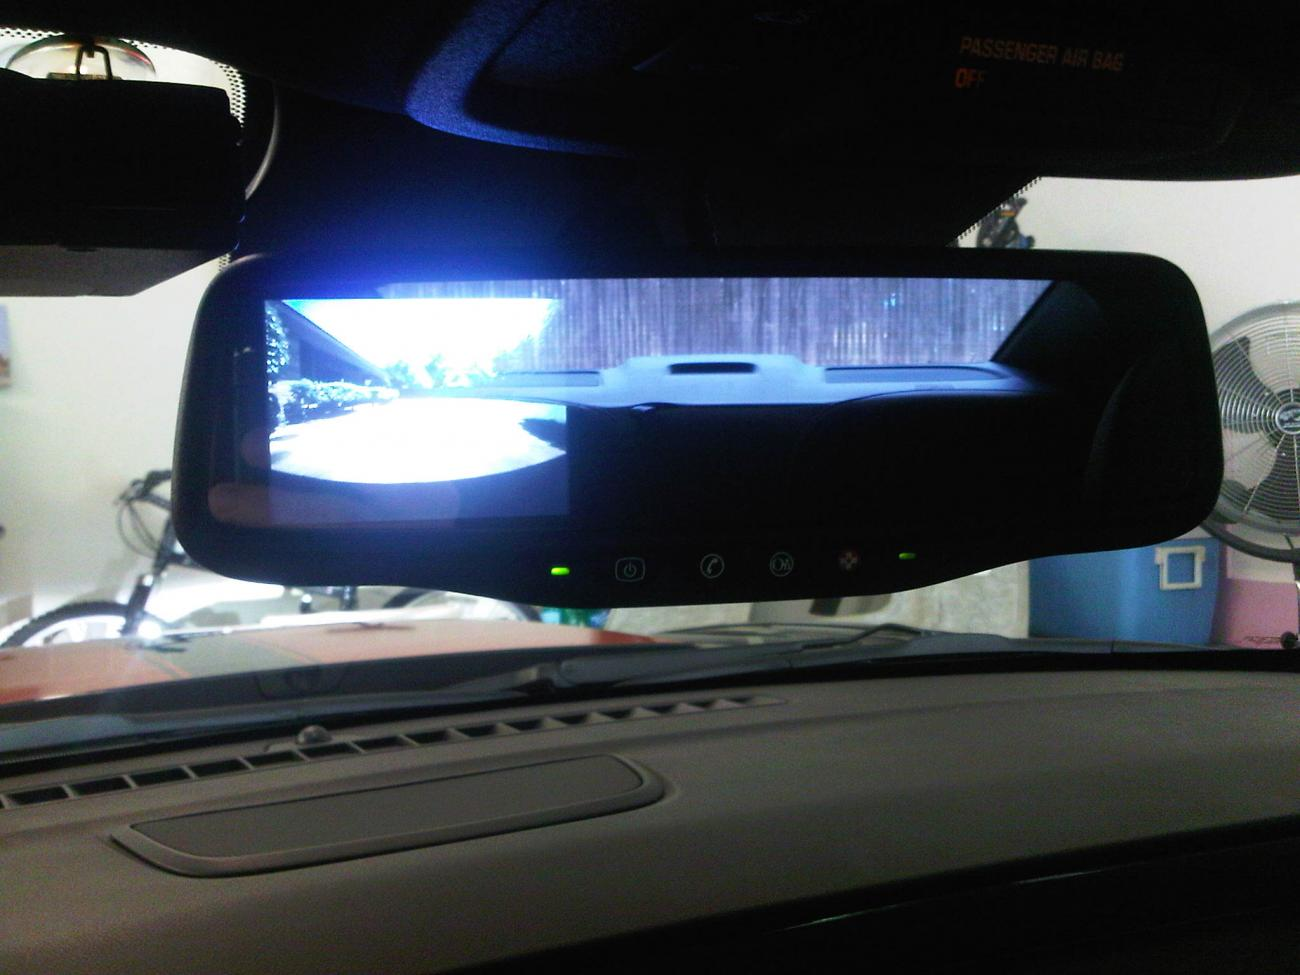 Fs Oem Camaro Rear View Camera System Plug And Play